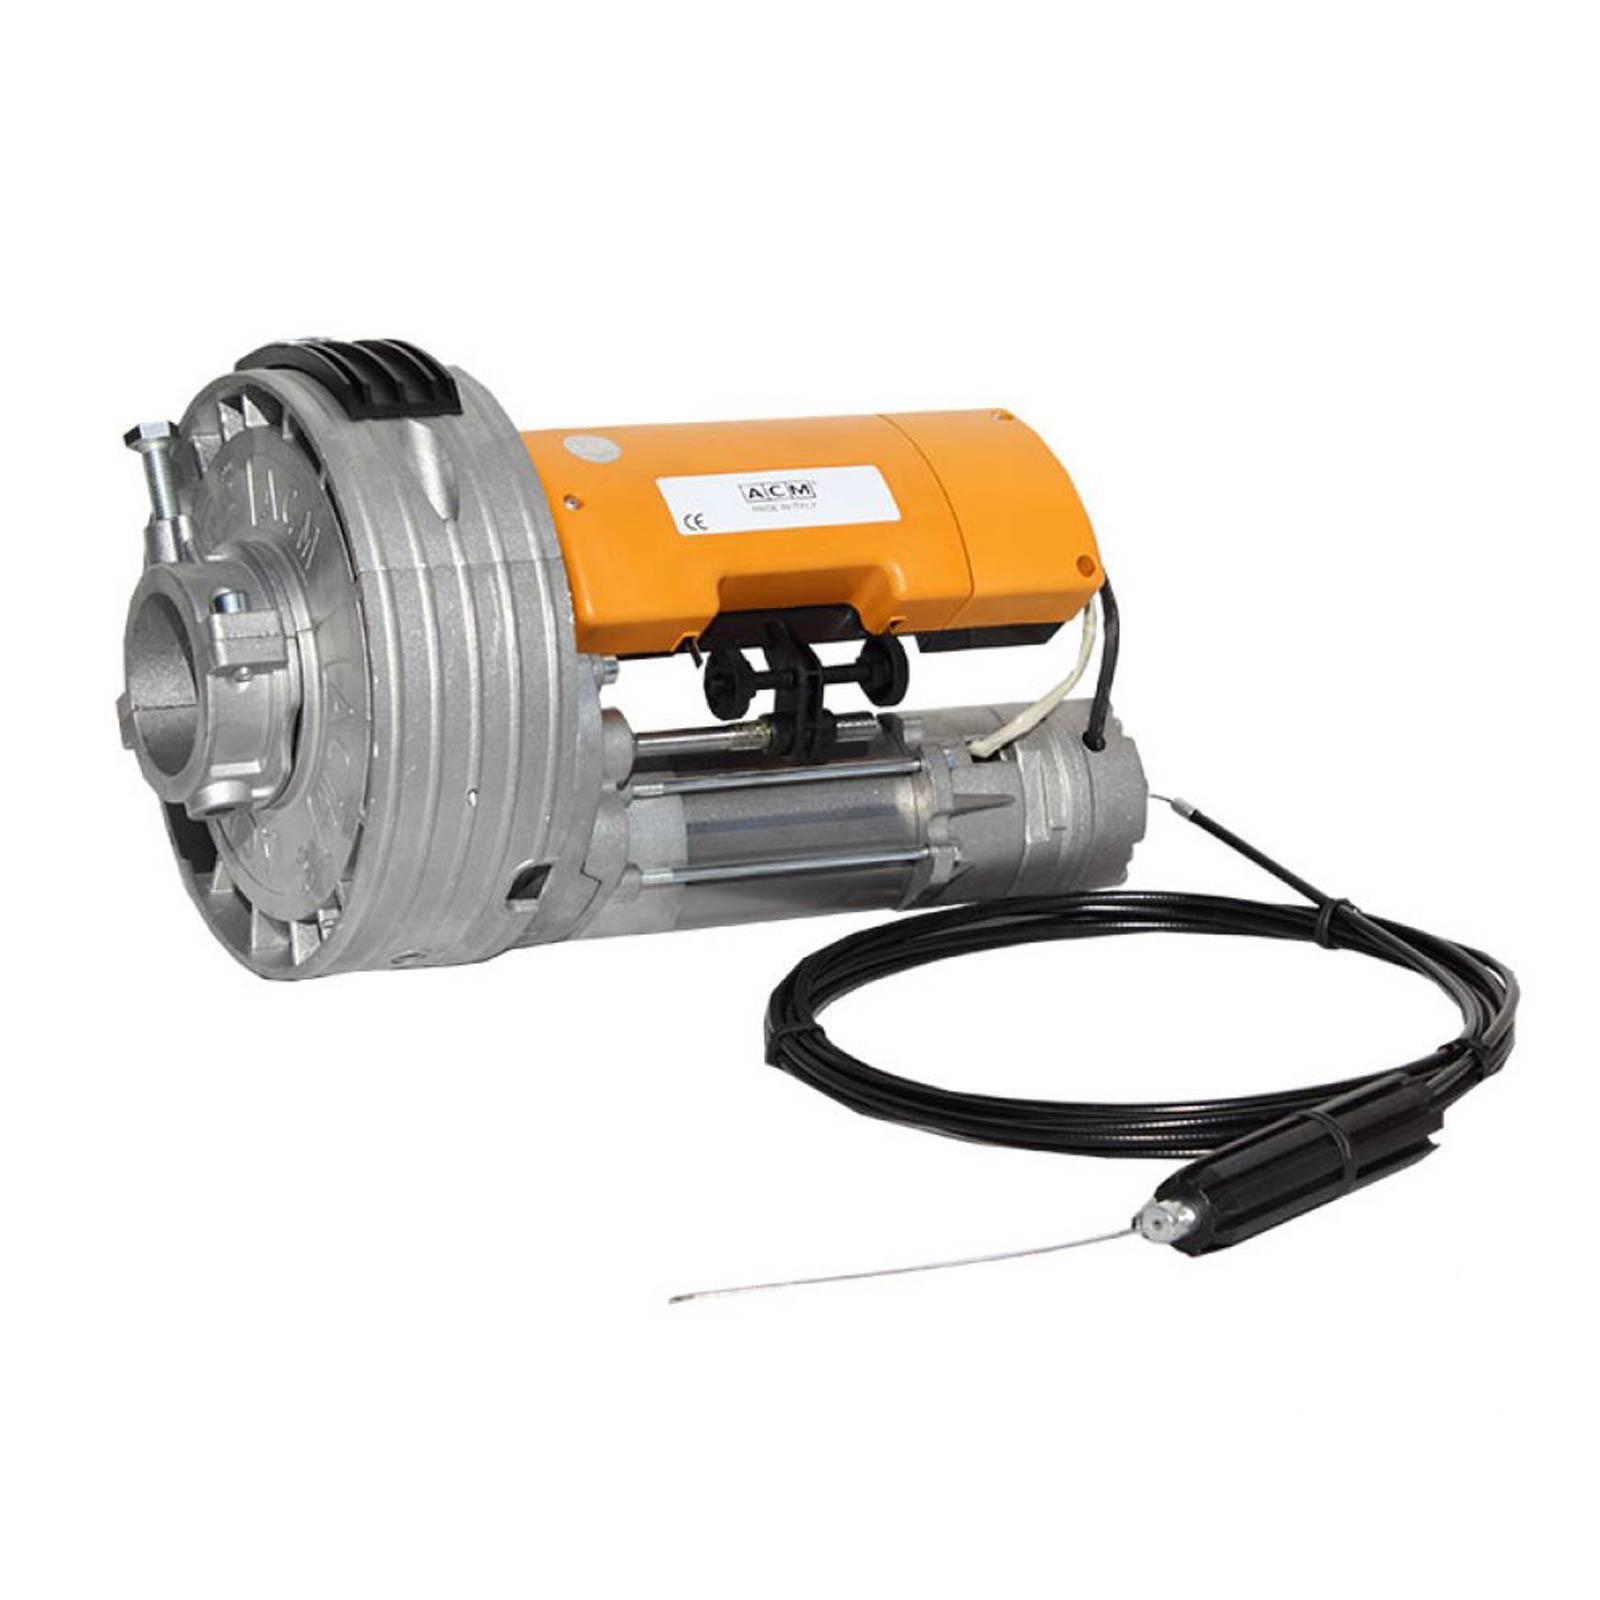 Automatismi Per Serrande Avvolgibili.Motore X Serrande Serranda Automatismo Con Elettrofreno Freno Blocco